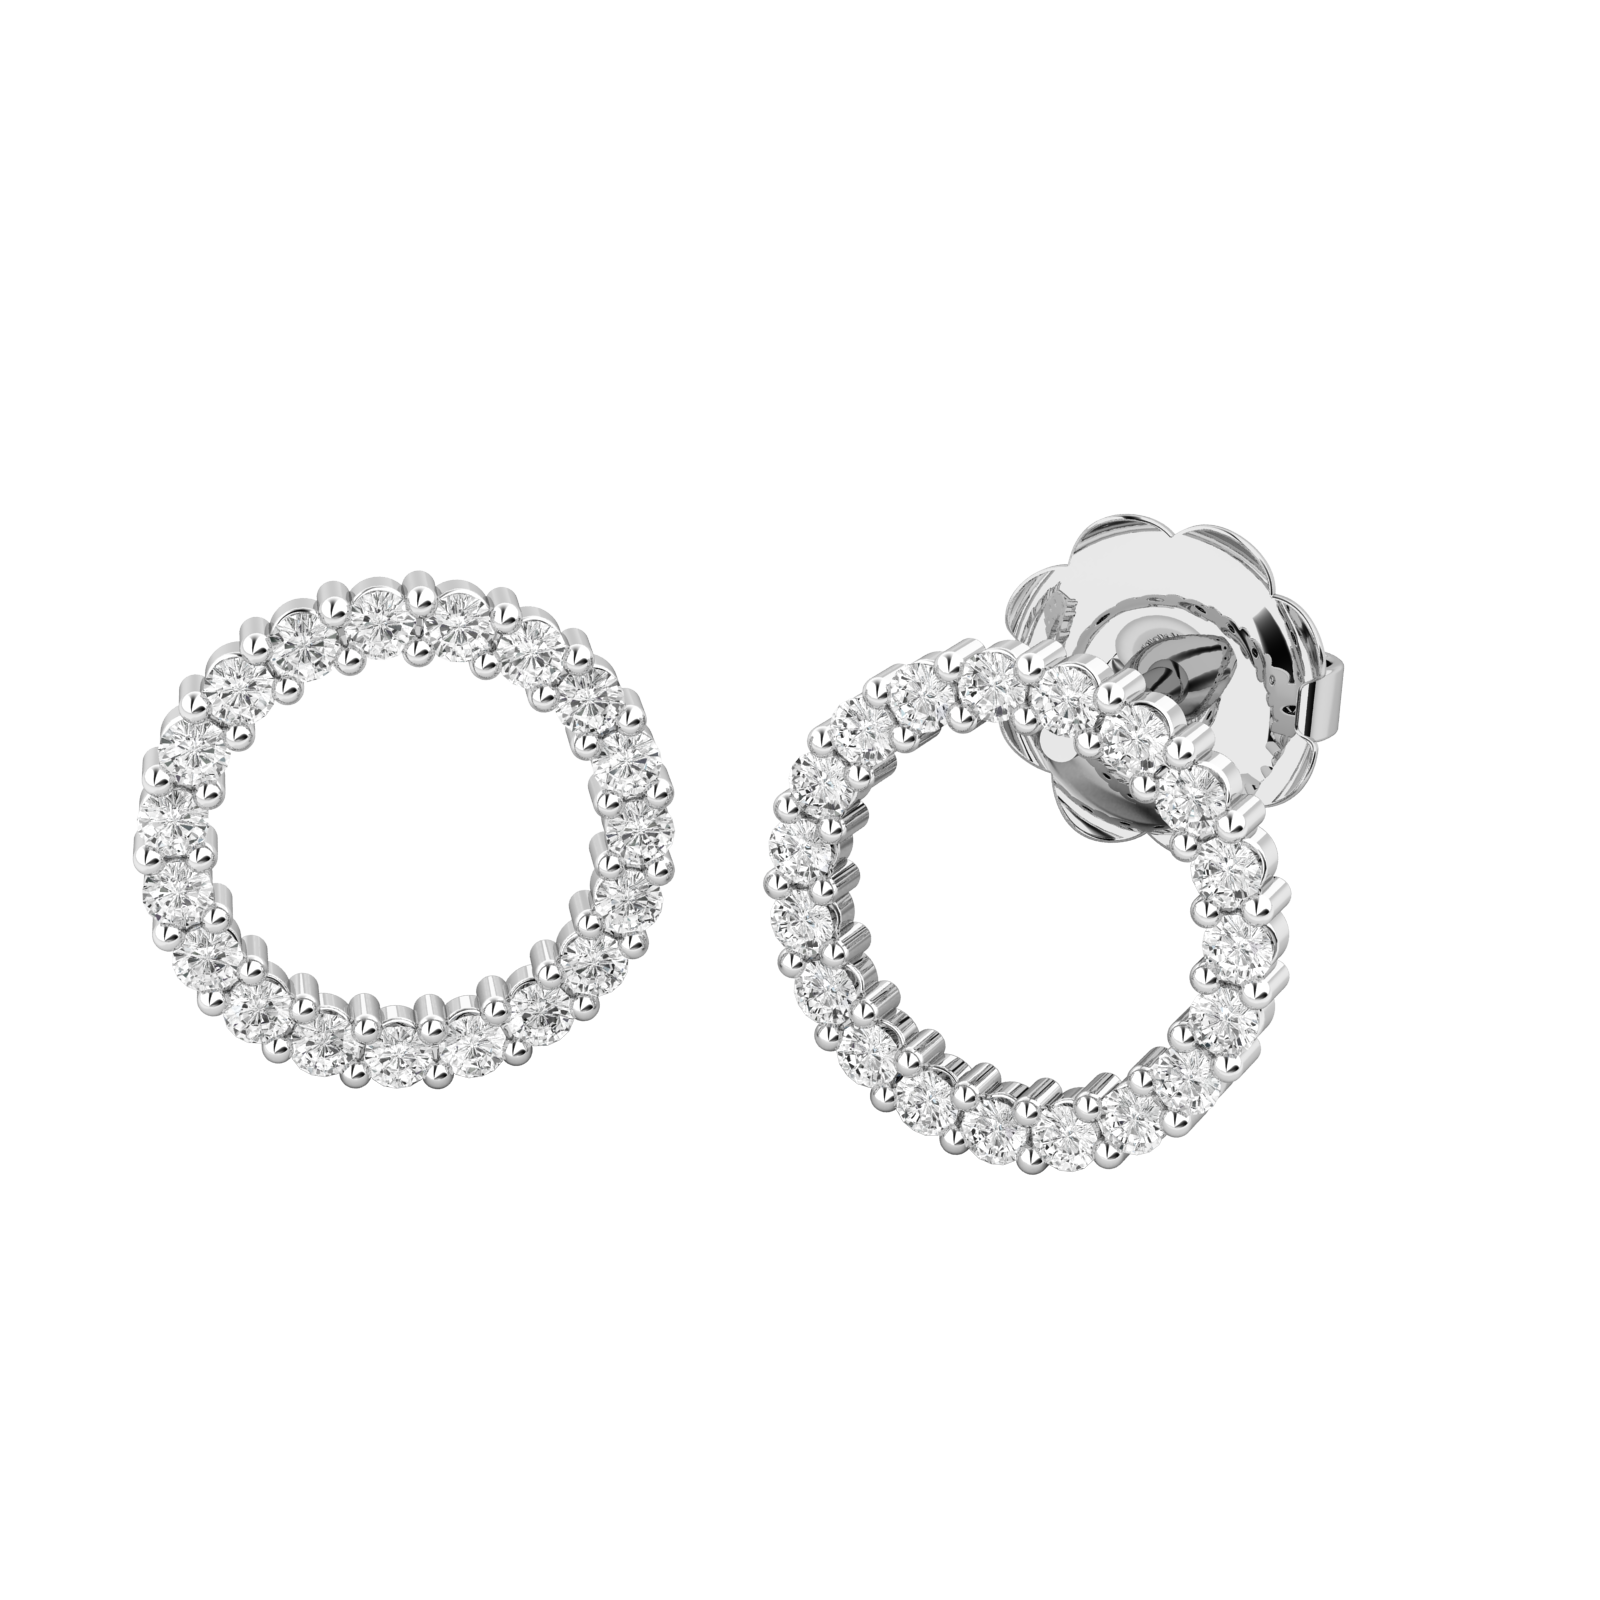 Cercei Aur Alb 18kt cu Diamante Rotund Briliant, Stil Halo-img1